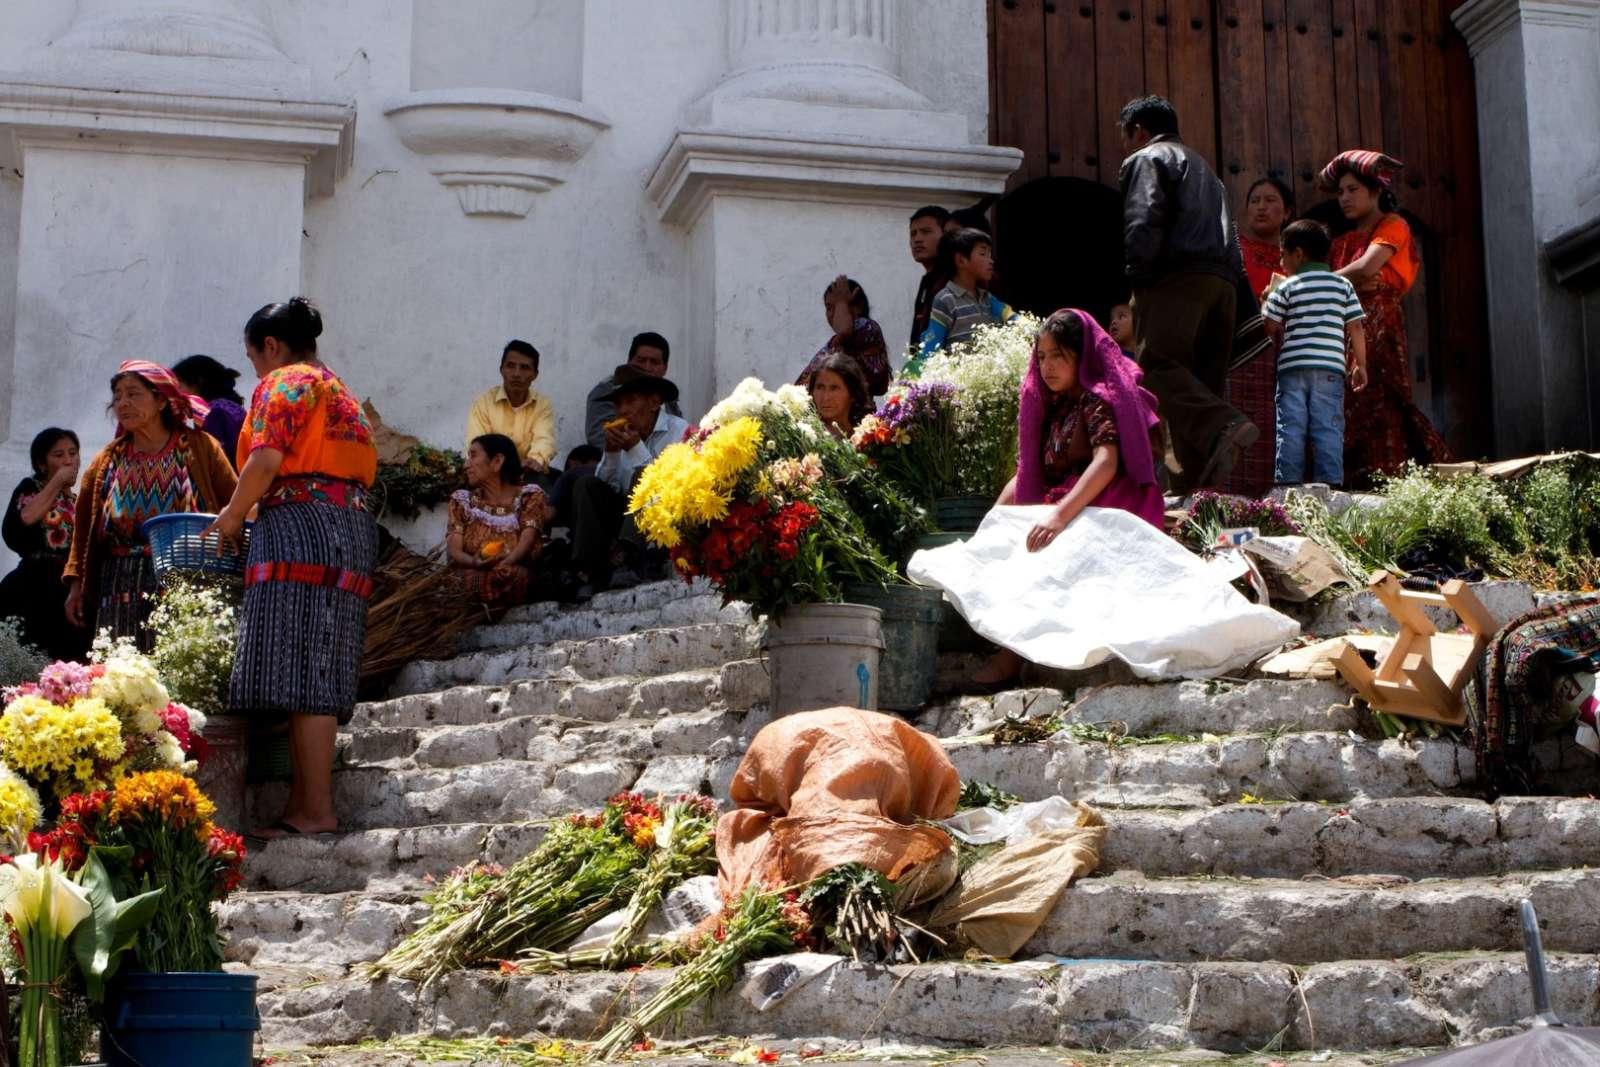 Girl selling flowers in Chichicastenango, Guatemala